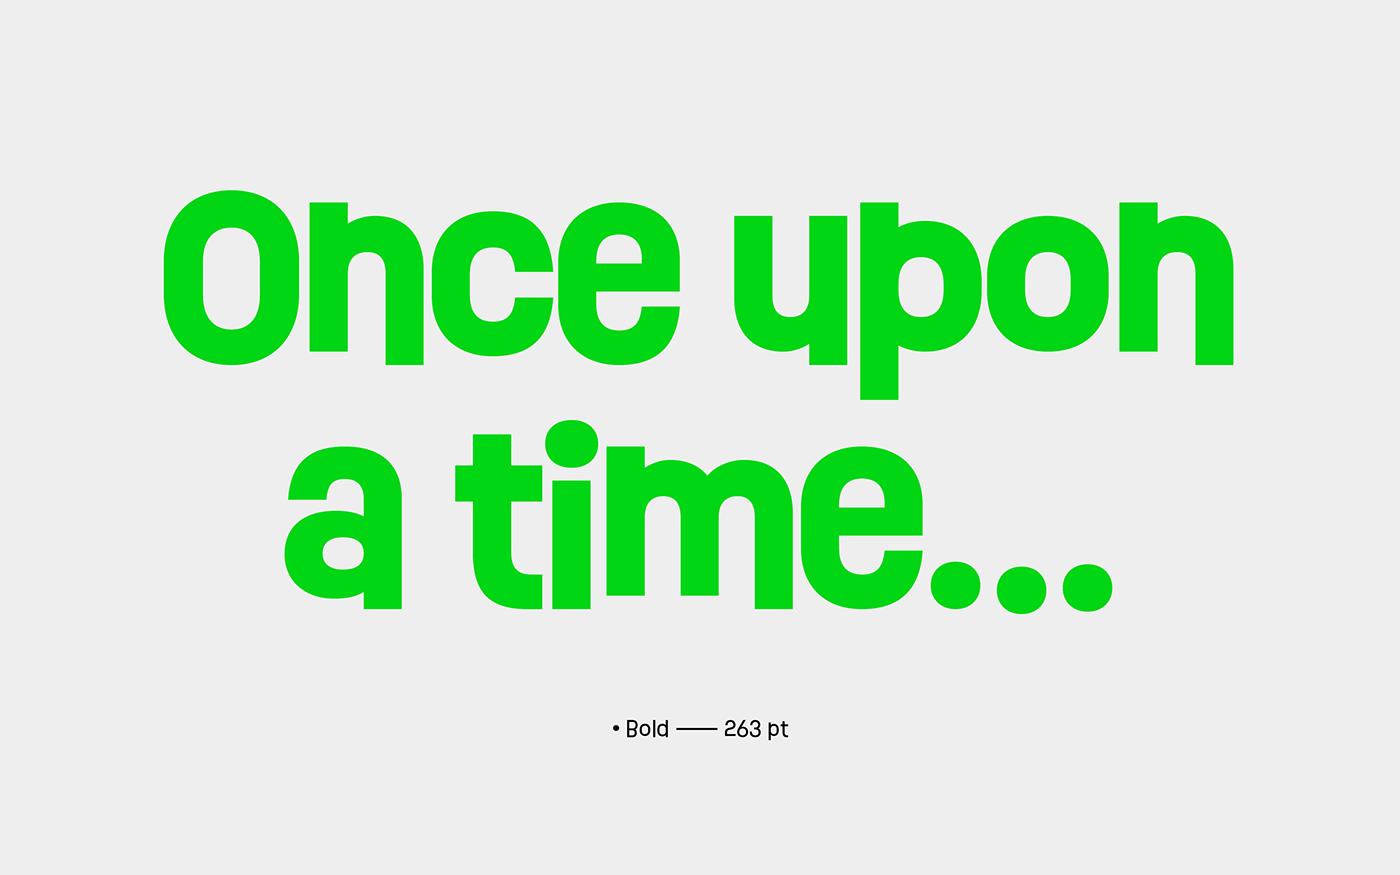 Packaging Headline cartoon publishing   animated branding  Typeface book movie ILLUSTRATION